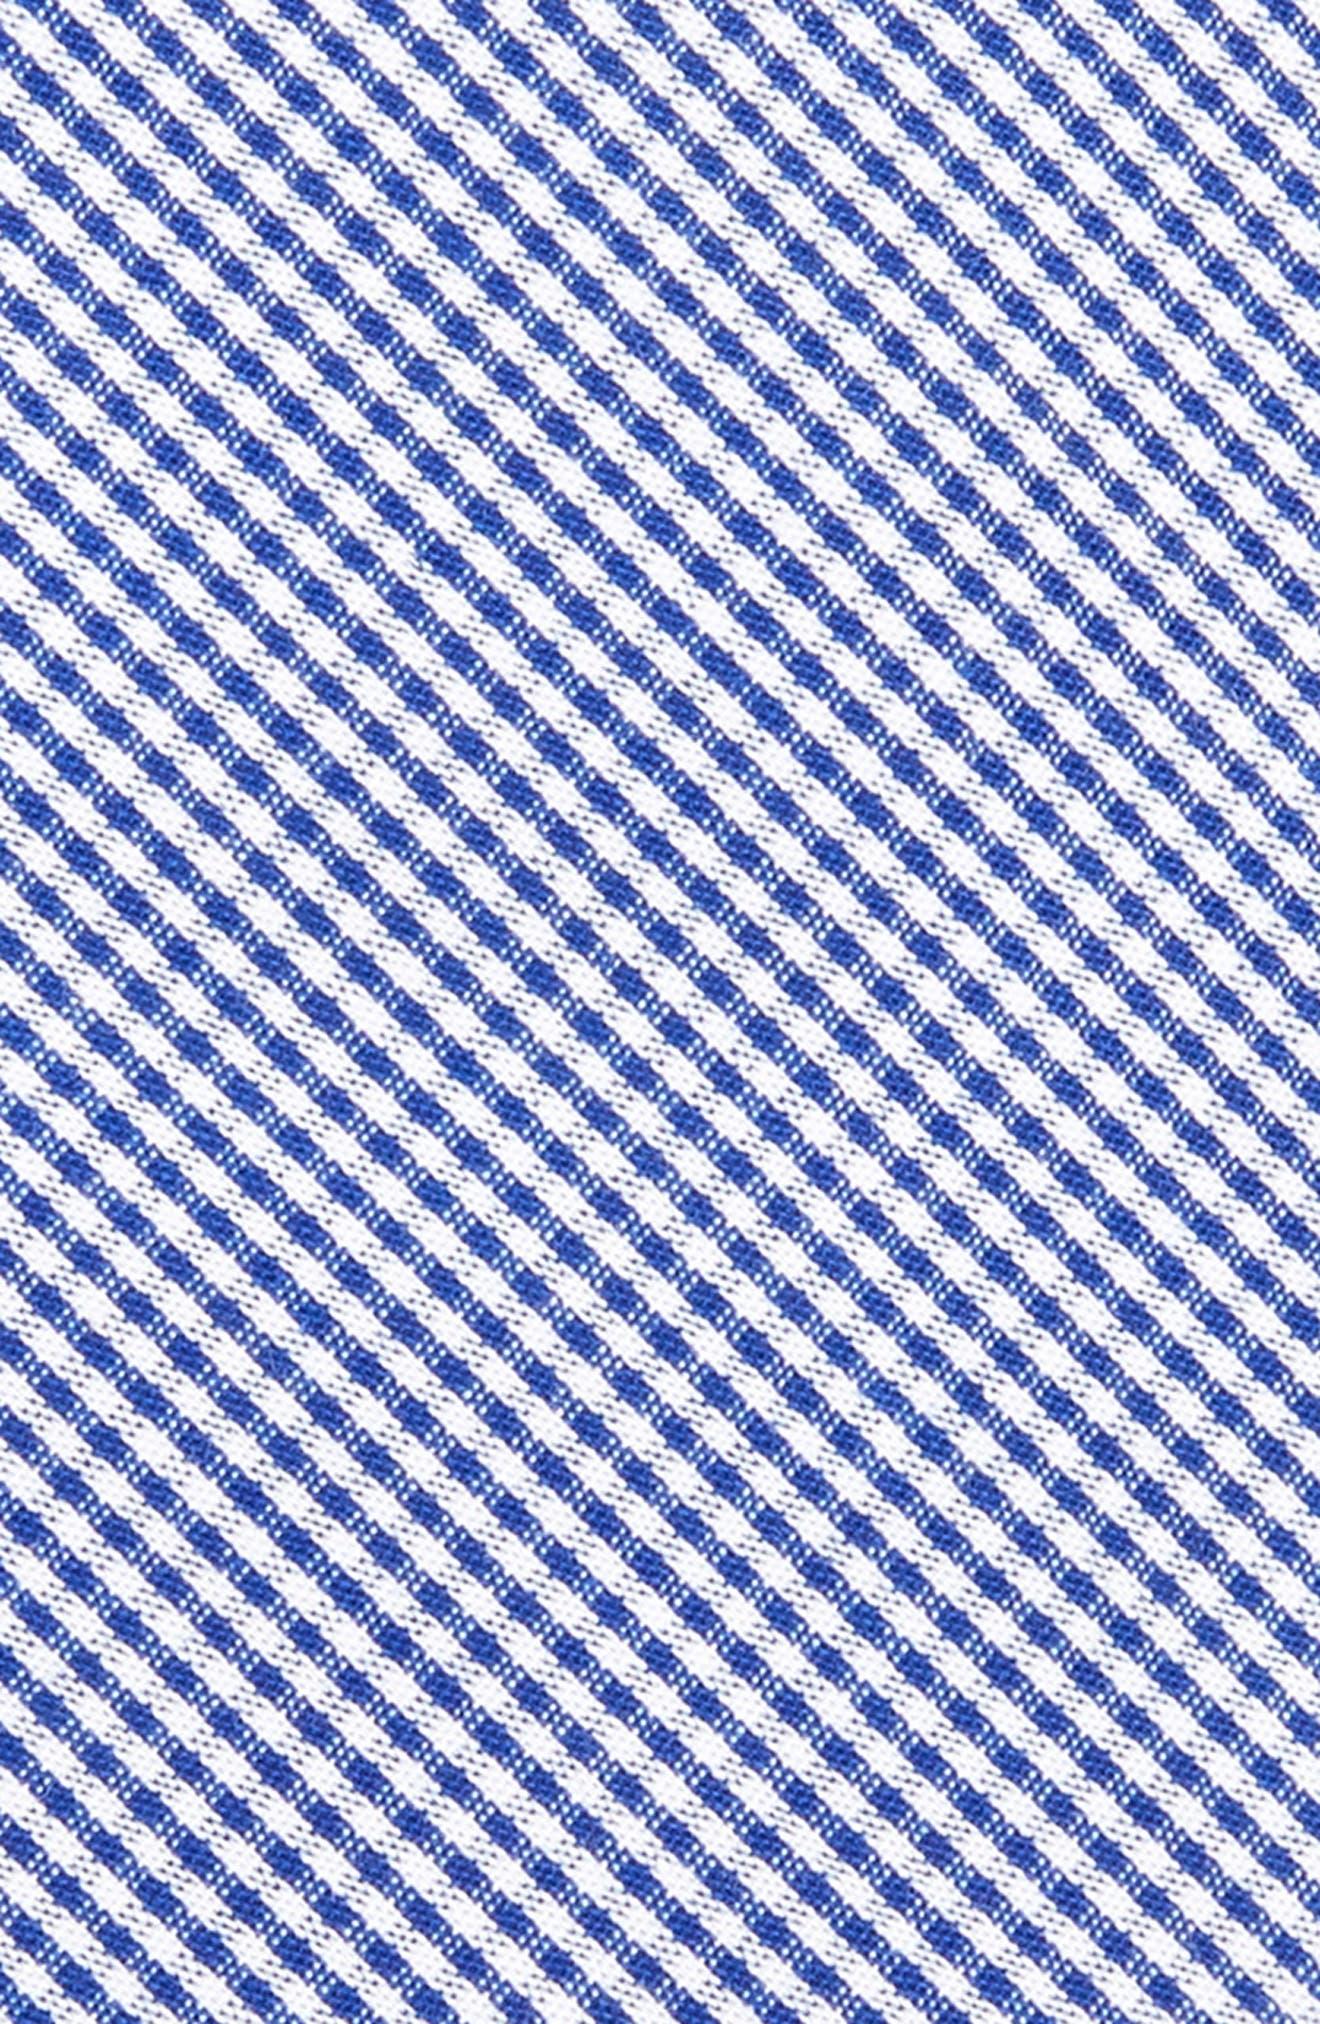 Alternate Image 2  - 1901 Check Cotton Tie